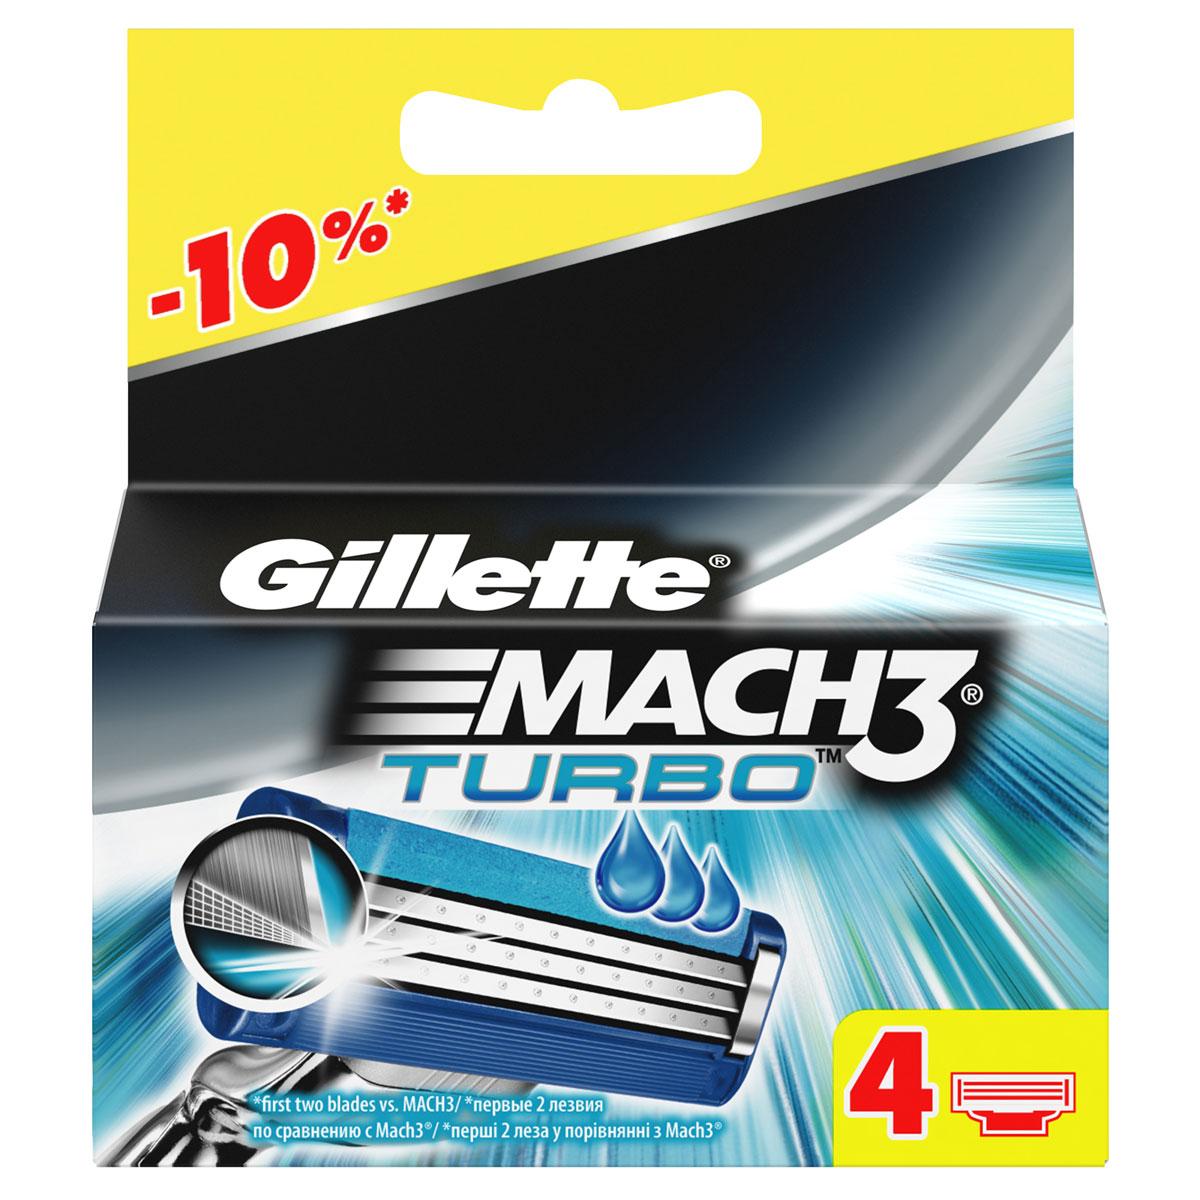 Сменные Кассеты Gillette Mach3 Turbo Для Мужской Бритвы, 4 шт ( MCT-13284677 )